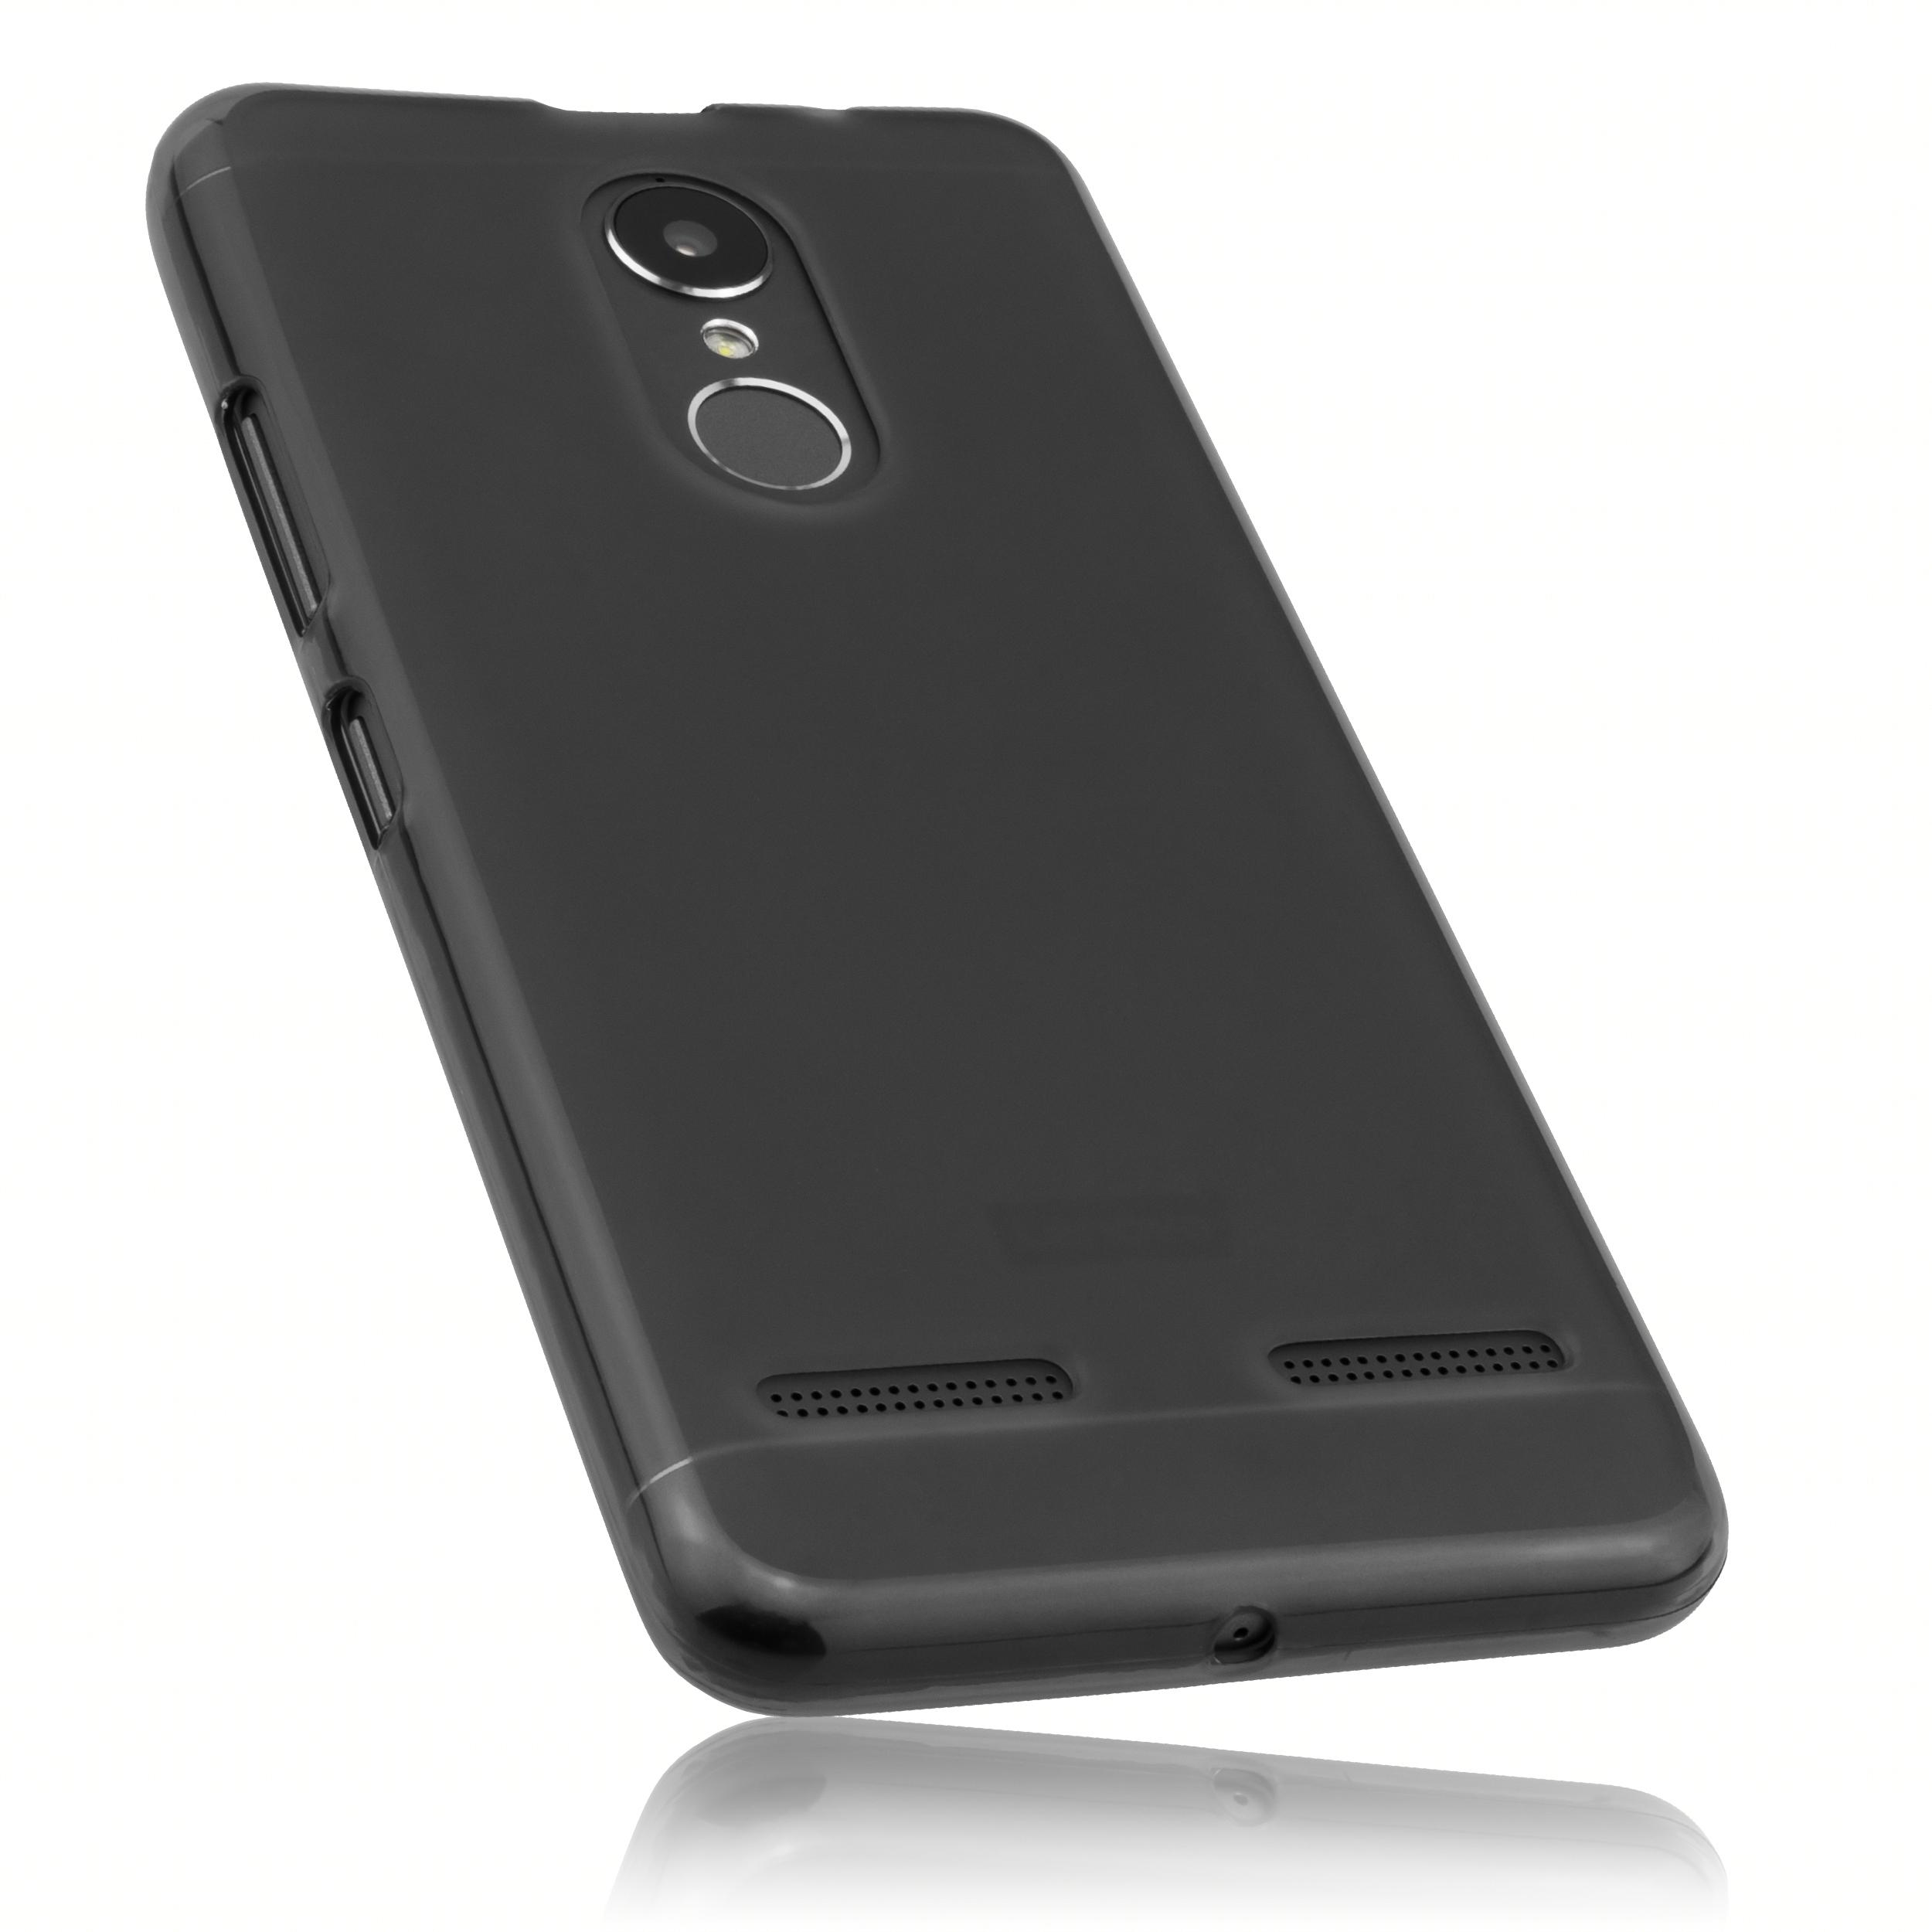 TPU Hülle schwarz transparent für Lenovo K6 Lenovo weitere Modelle Weitere Modelle Hersteller